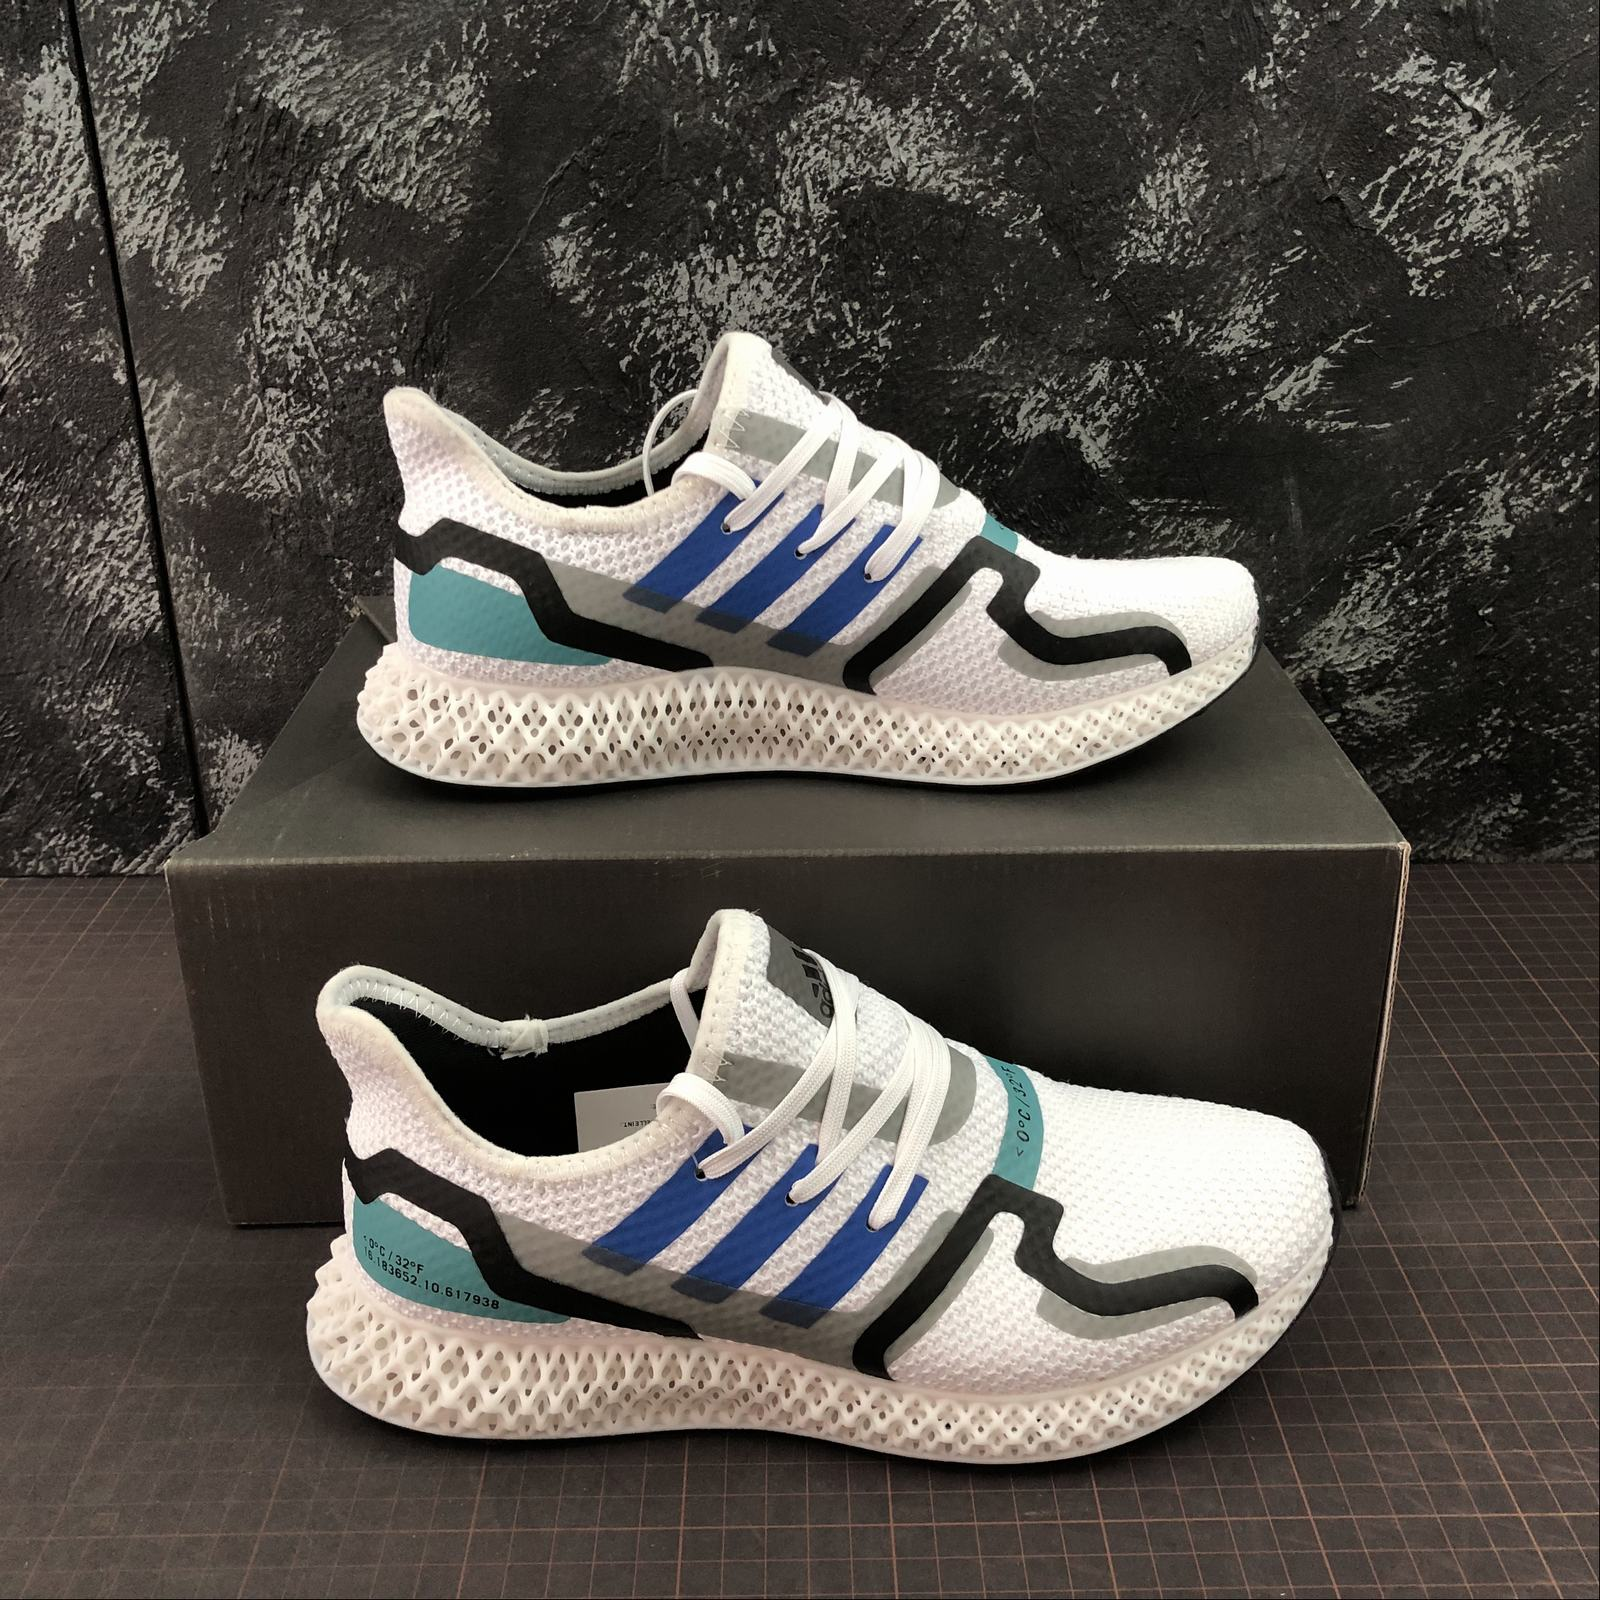 giay-sneaker-adidas-futurecraft-4d-eq8801